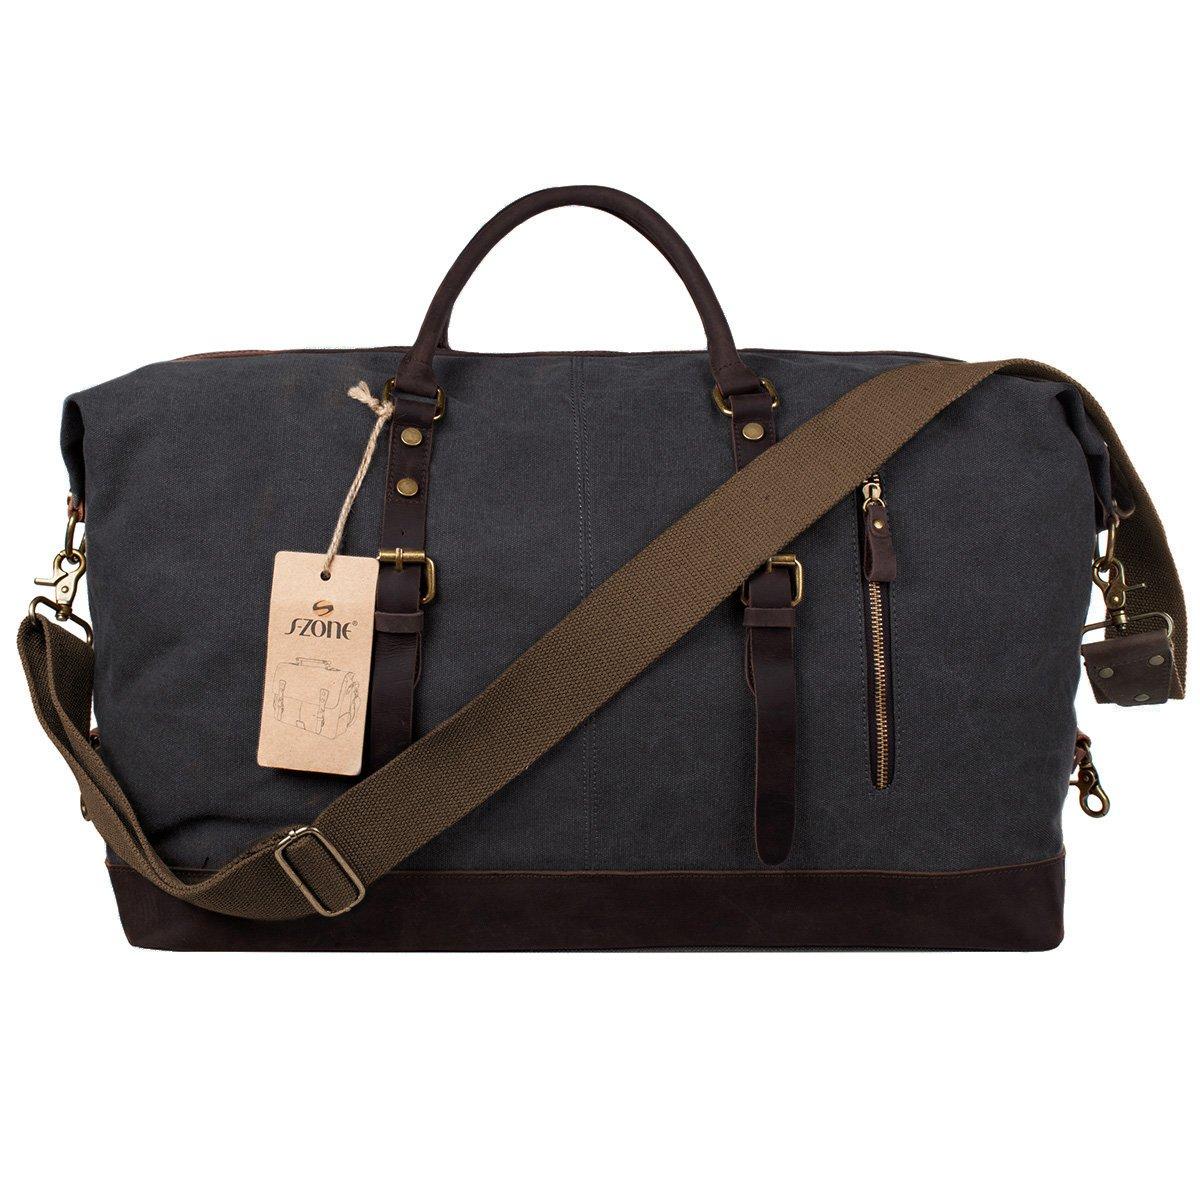 S-ZONE Oversized Canvas Genuine Leather Trim Travel Tote Duffel Shoulder Handbag Weekend Bag